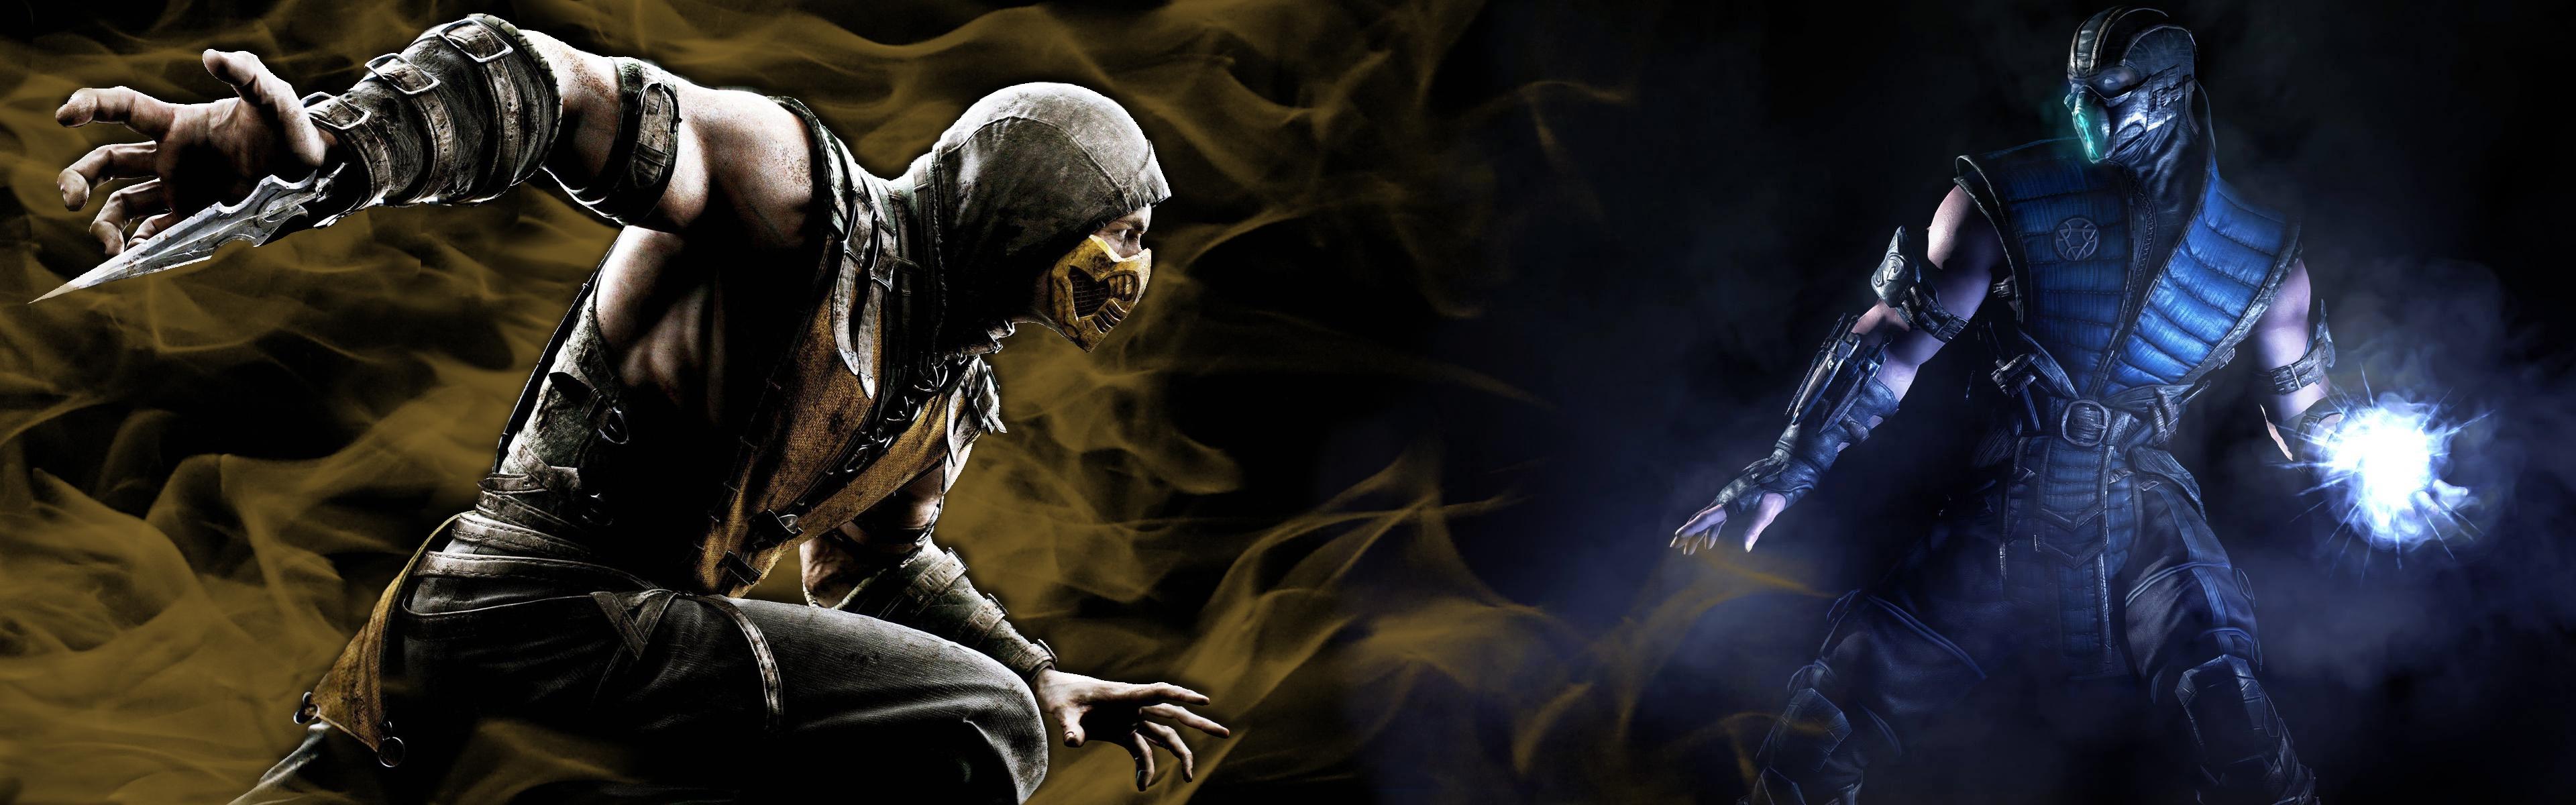 Mortal Kombat Scorpion Wallpaper (68+ images)